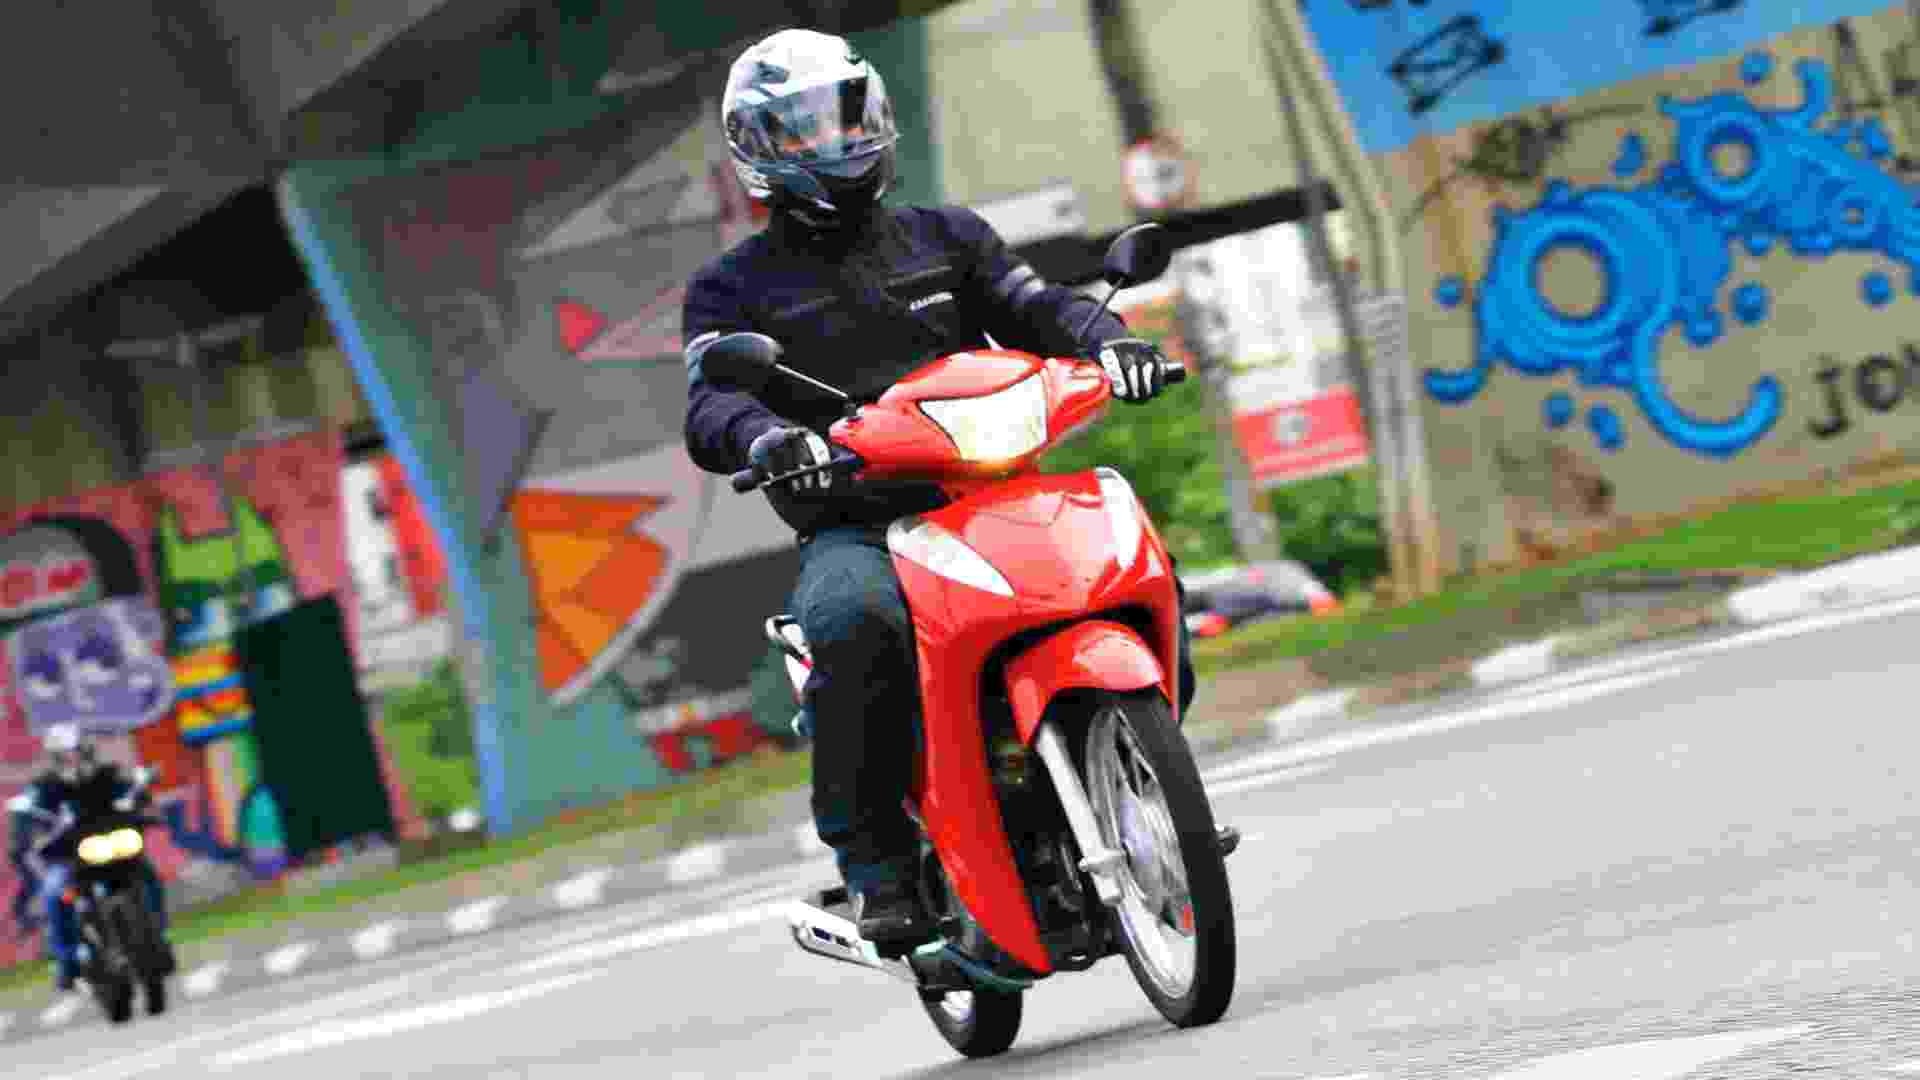 Honda Biz 110i 2016 - Mario Villaescusa/Infomoto